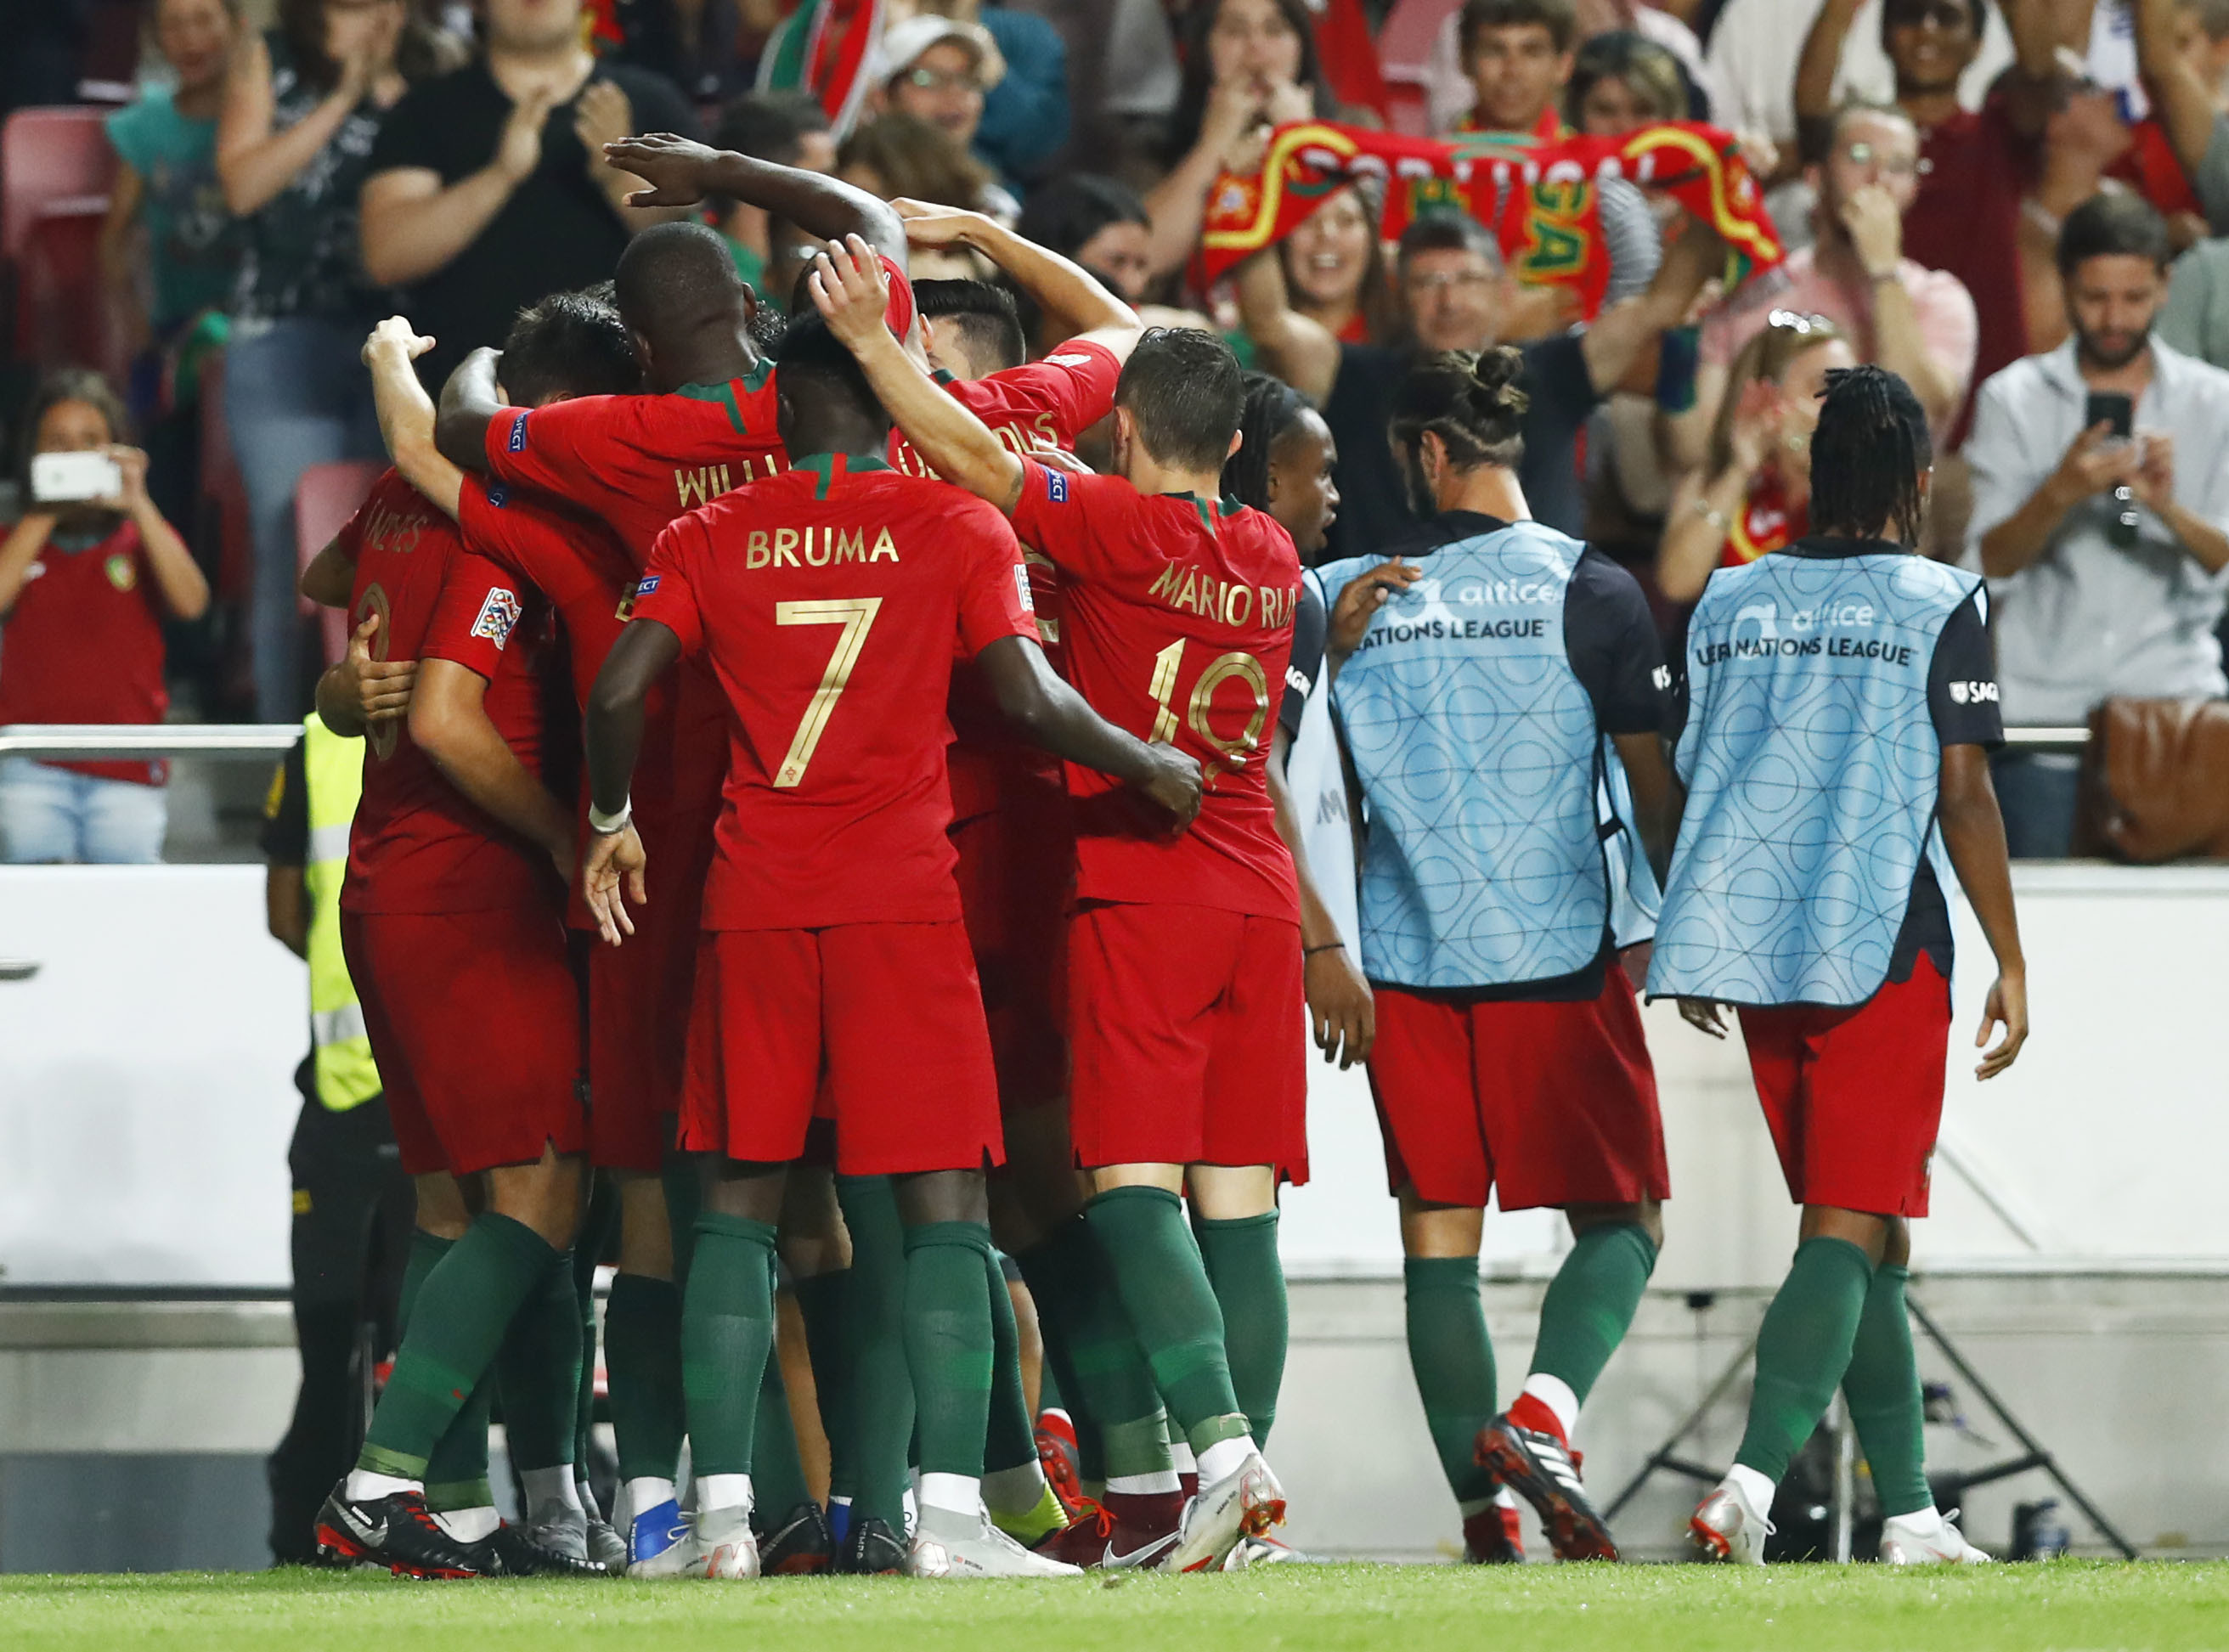 Portugalia to nie tylko Cristiano Ronaldo